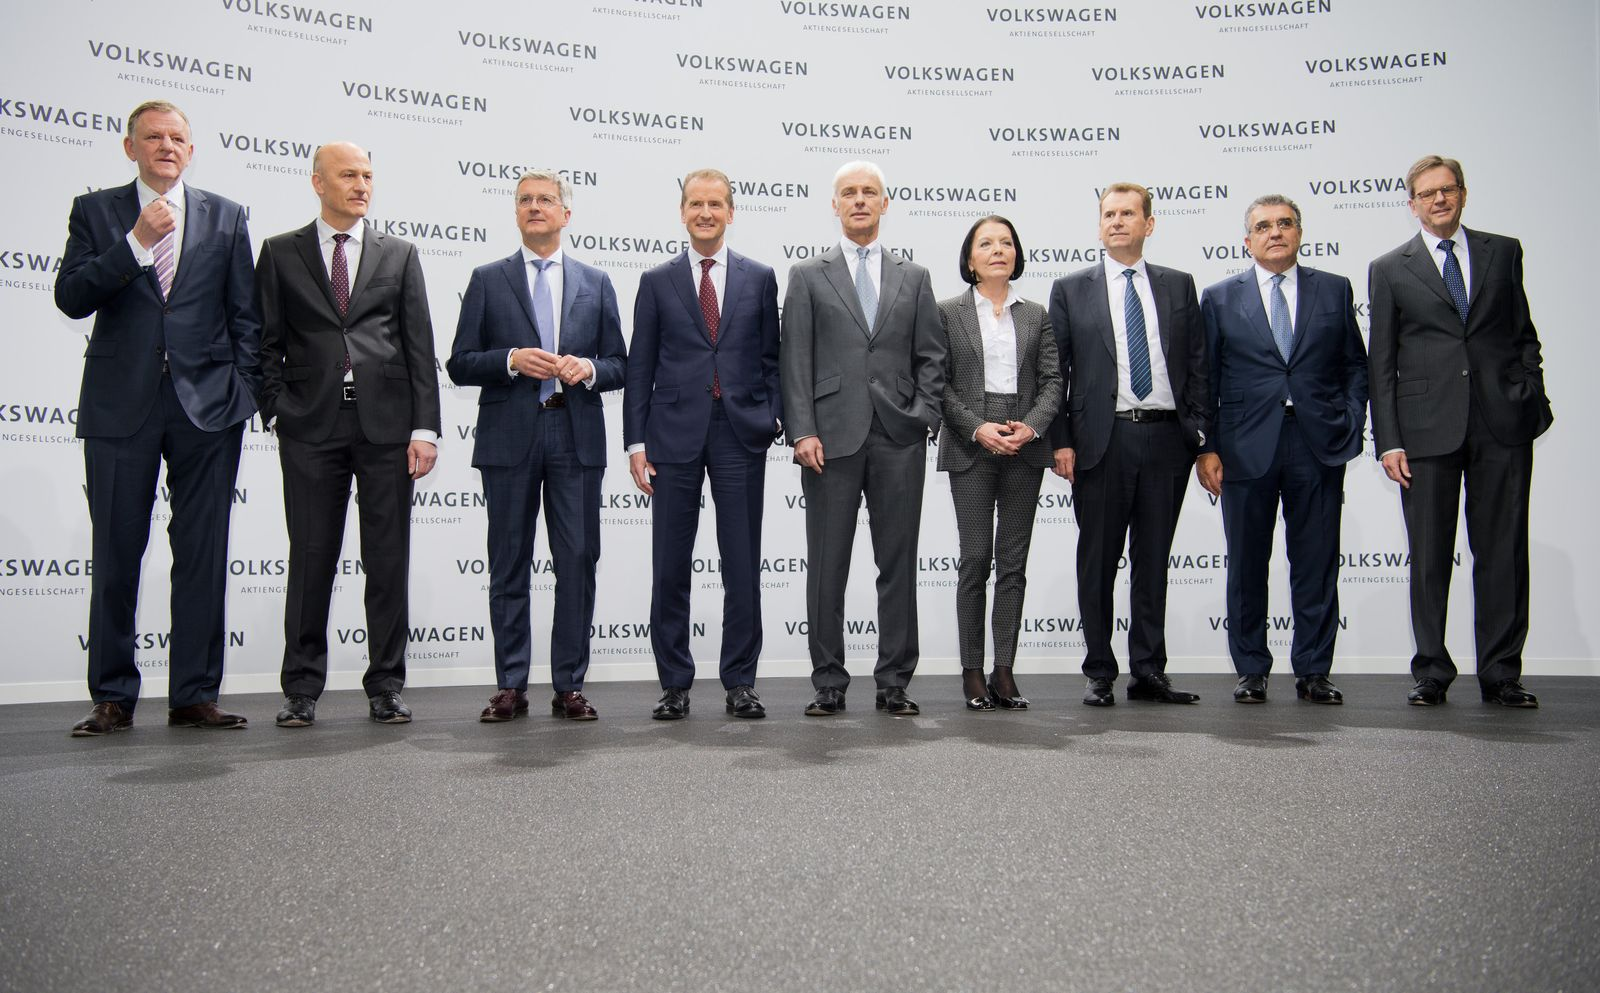 Volkswagen - Bilanzpressekonferenz